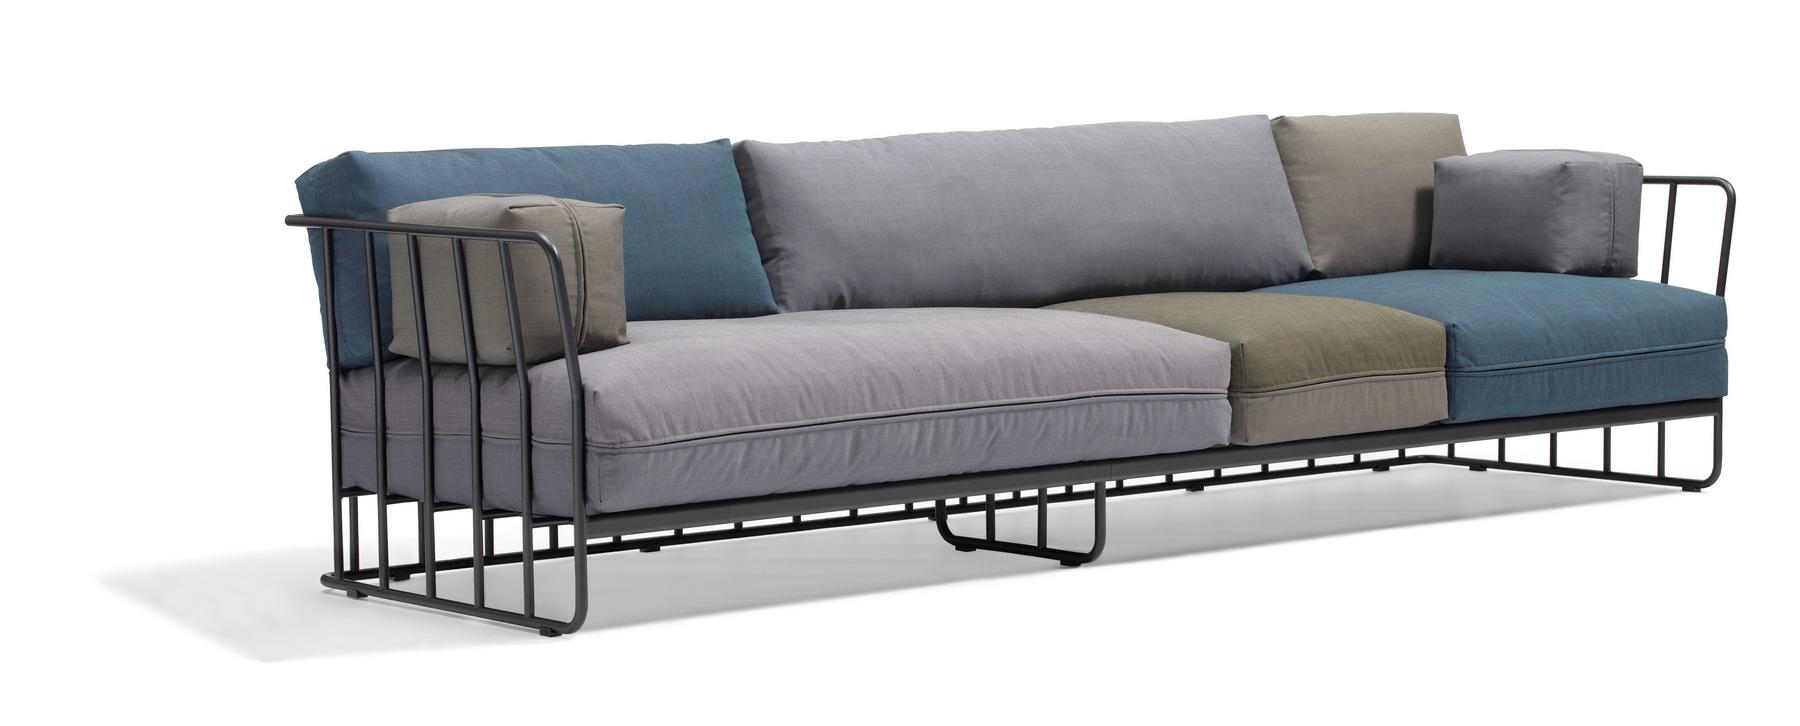 Scandinavisch design op de milaan furniture fair 2014 for Scandinavisch design bank